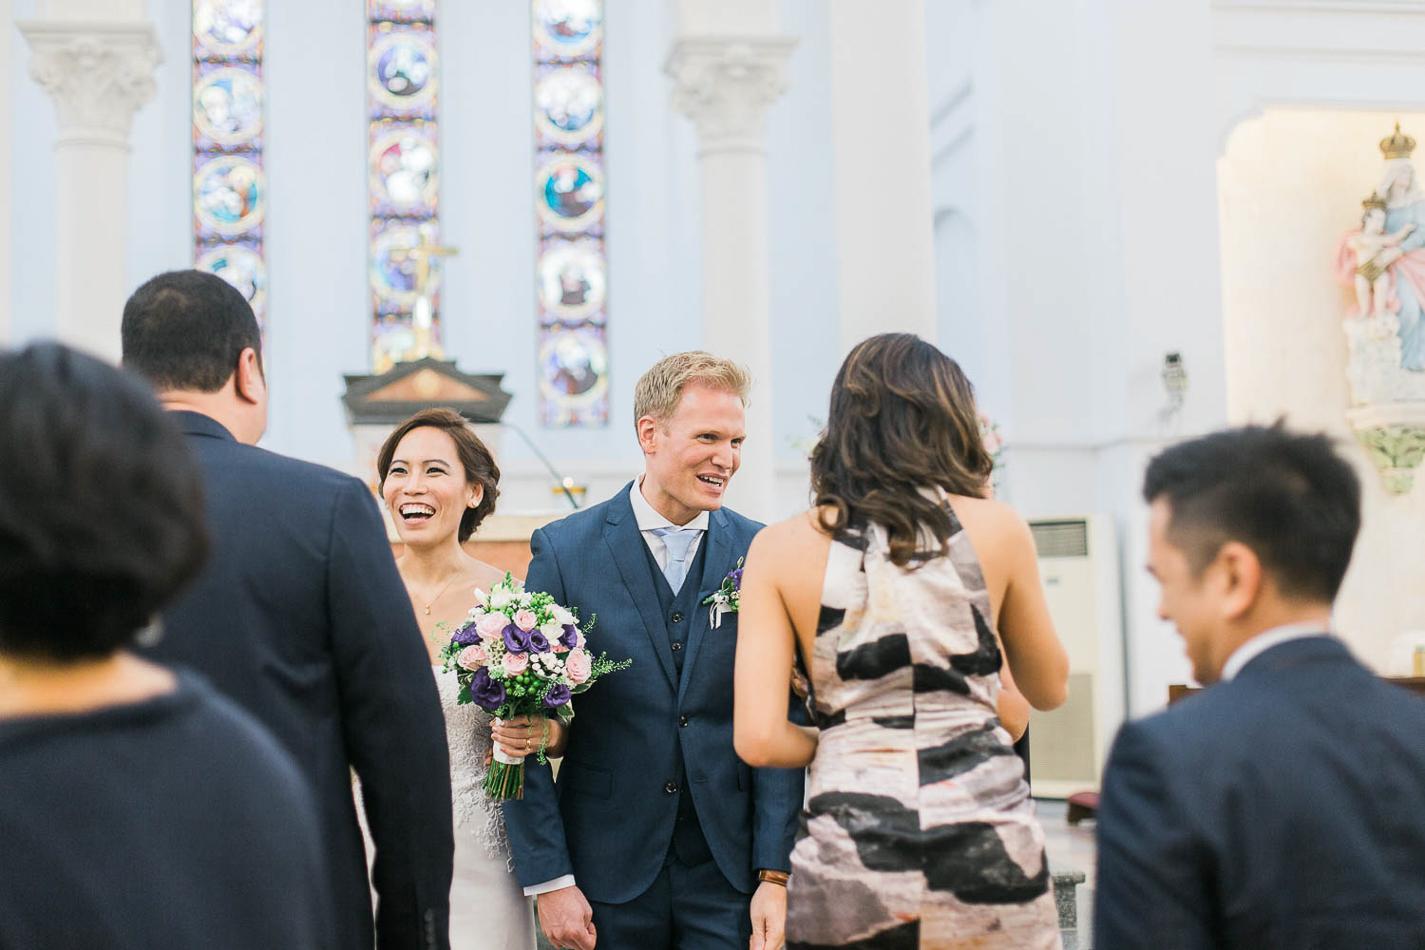 wedding-photographer-singapore-film-photographer-chen-sands-Anglea-wedding-CSPBLOG-17.jpg